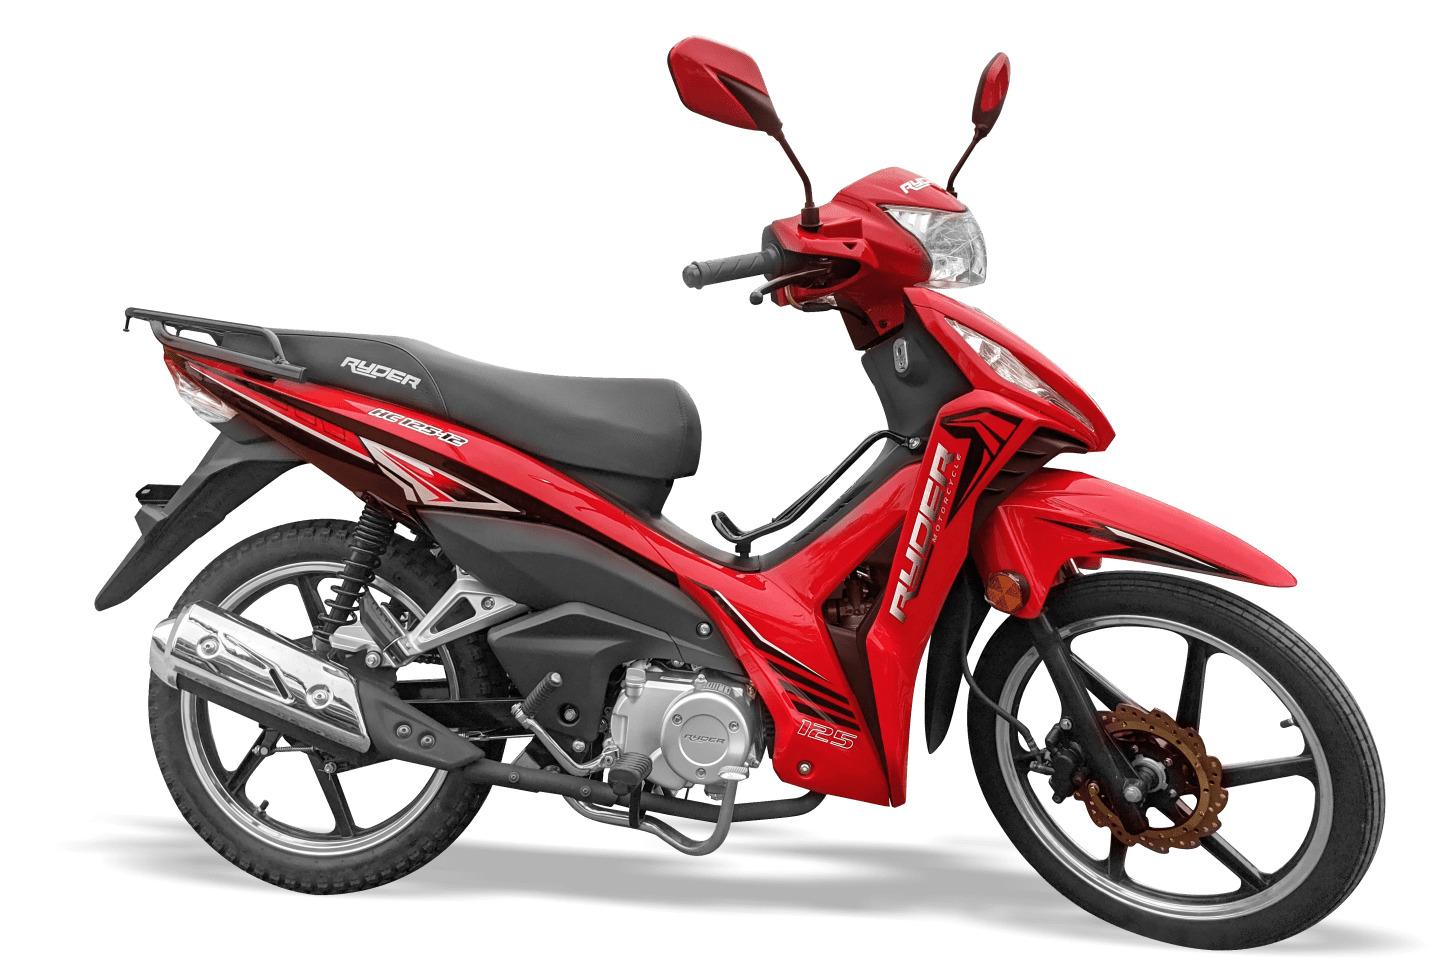 MOTO 125 RYDER HC125-12